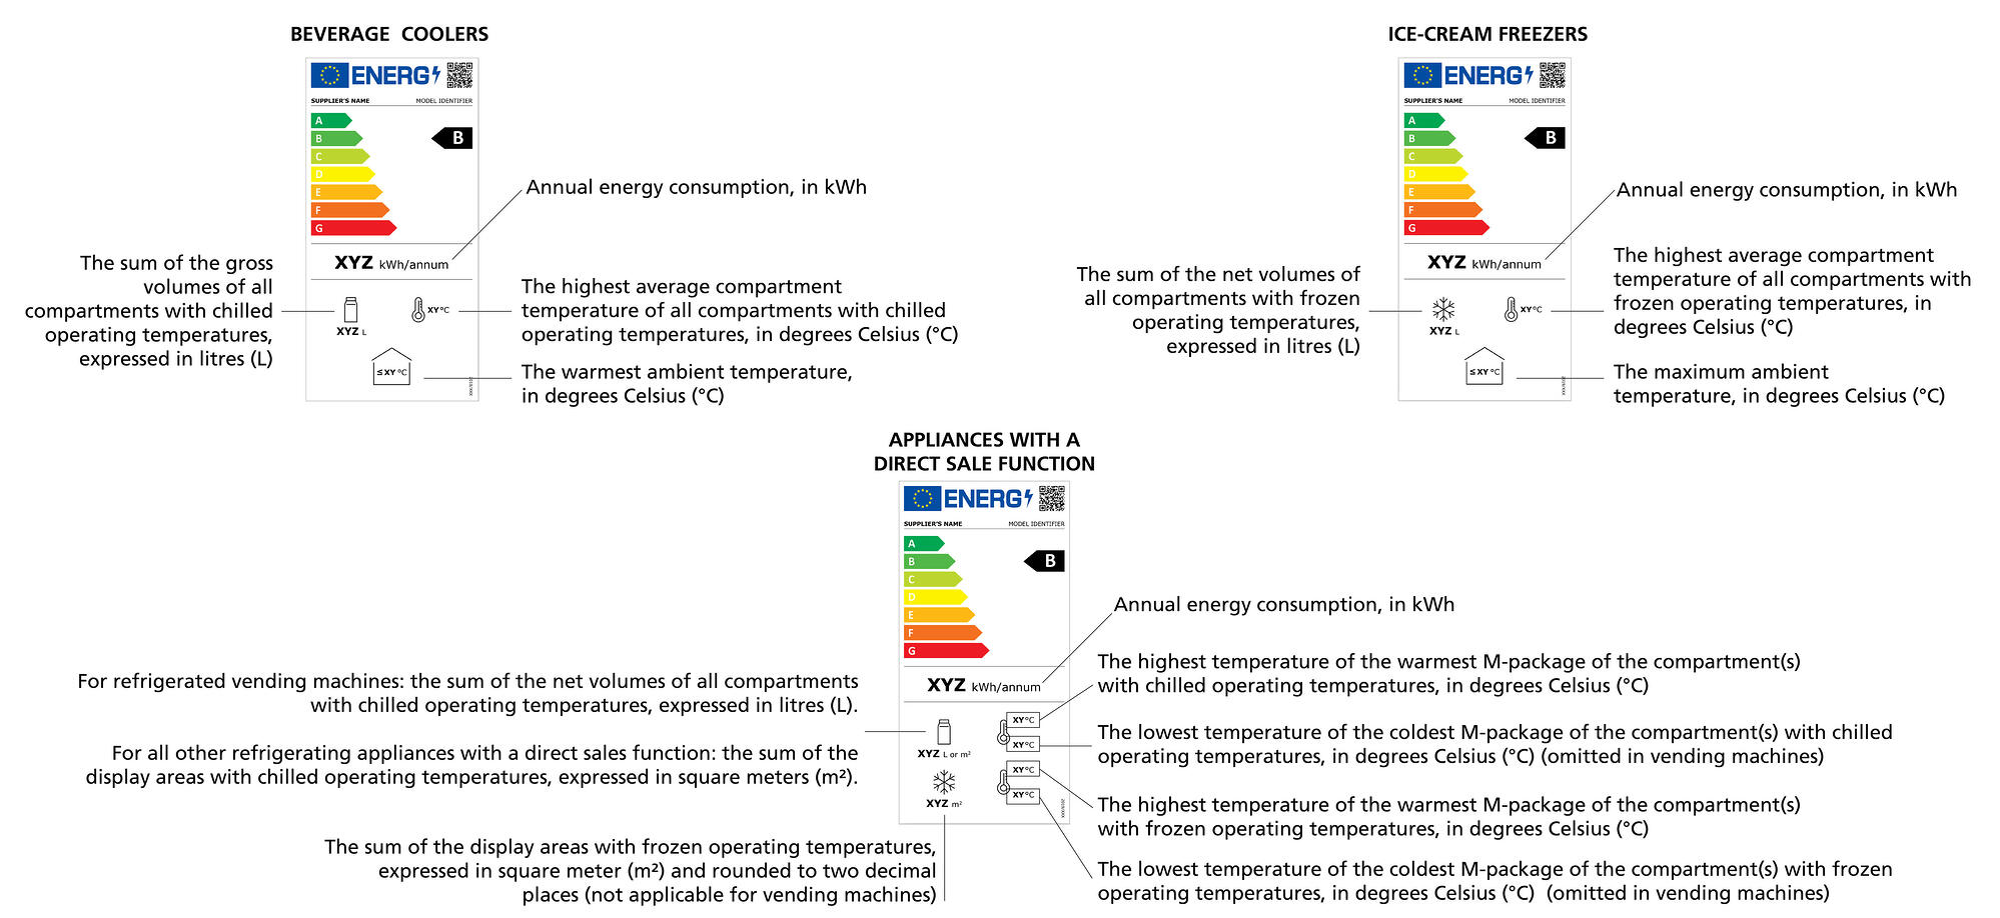 Energy_labelling_European_Union